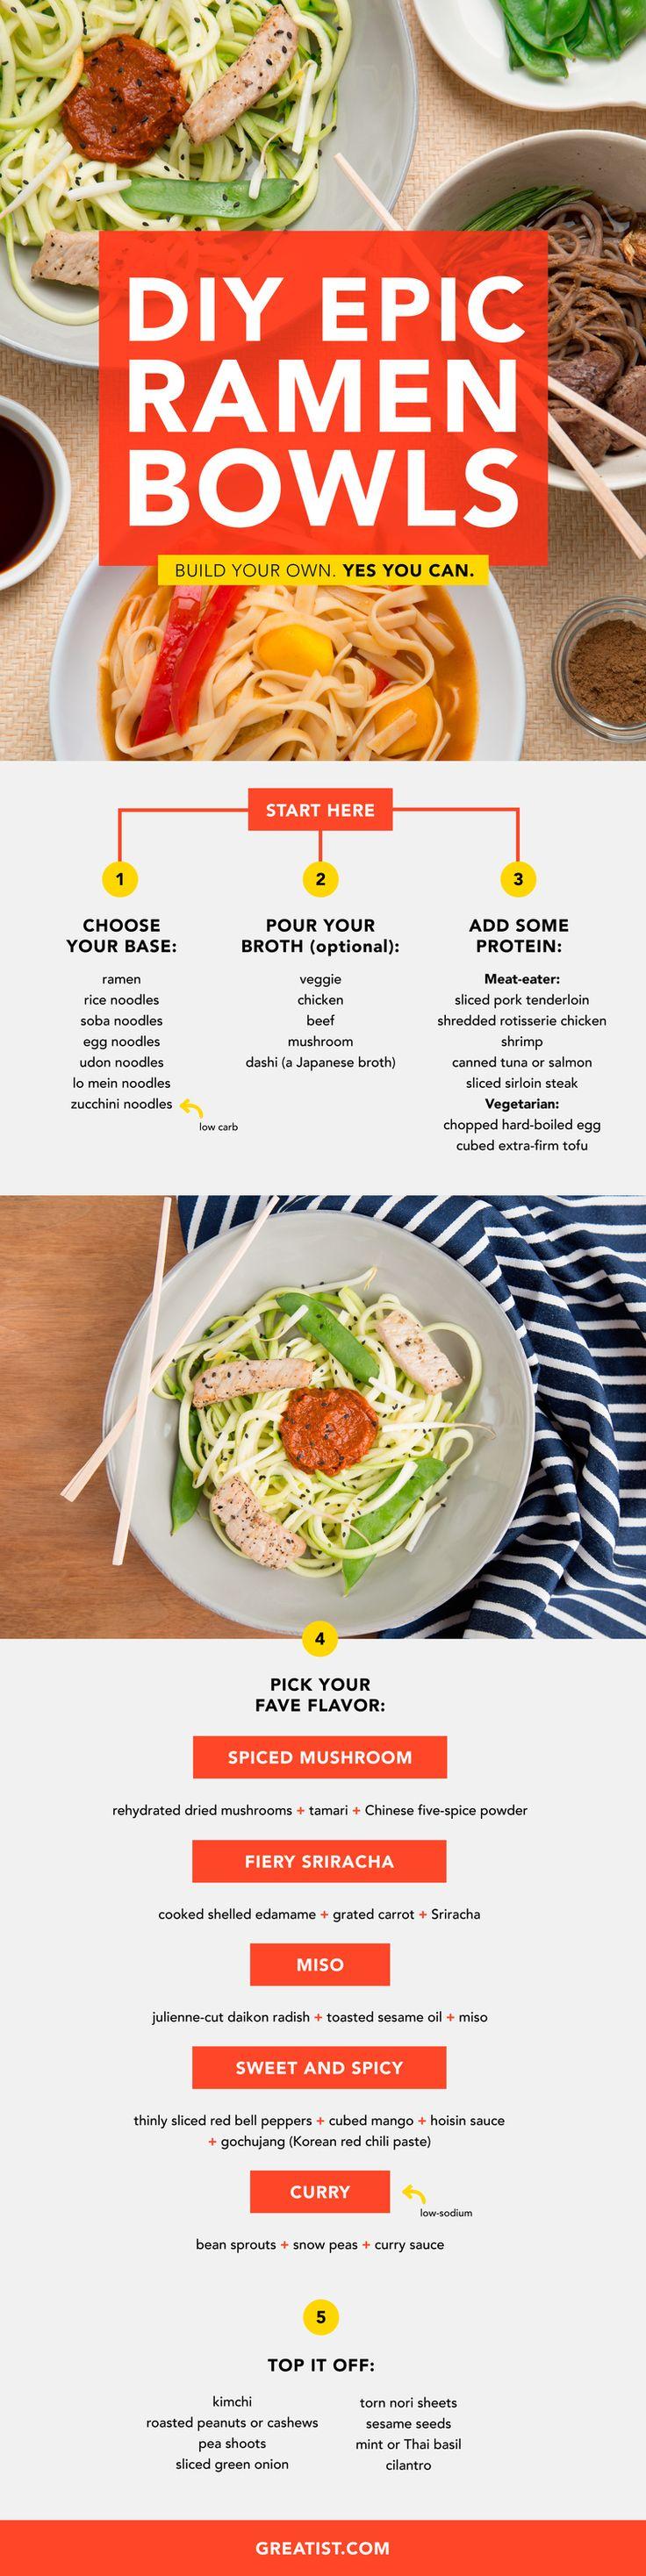 How to Make Epic Ramen Bowls at Home #ramen #recipe http://greatist.com/eat/how-to-make-healthy-ramen-bowl